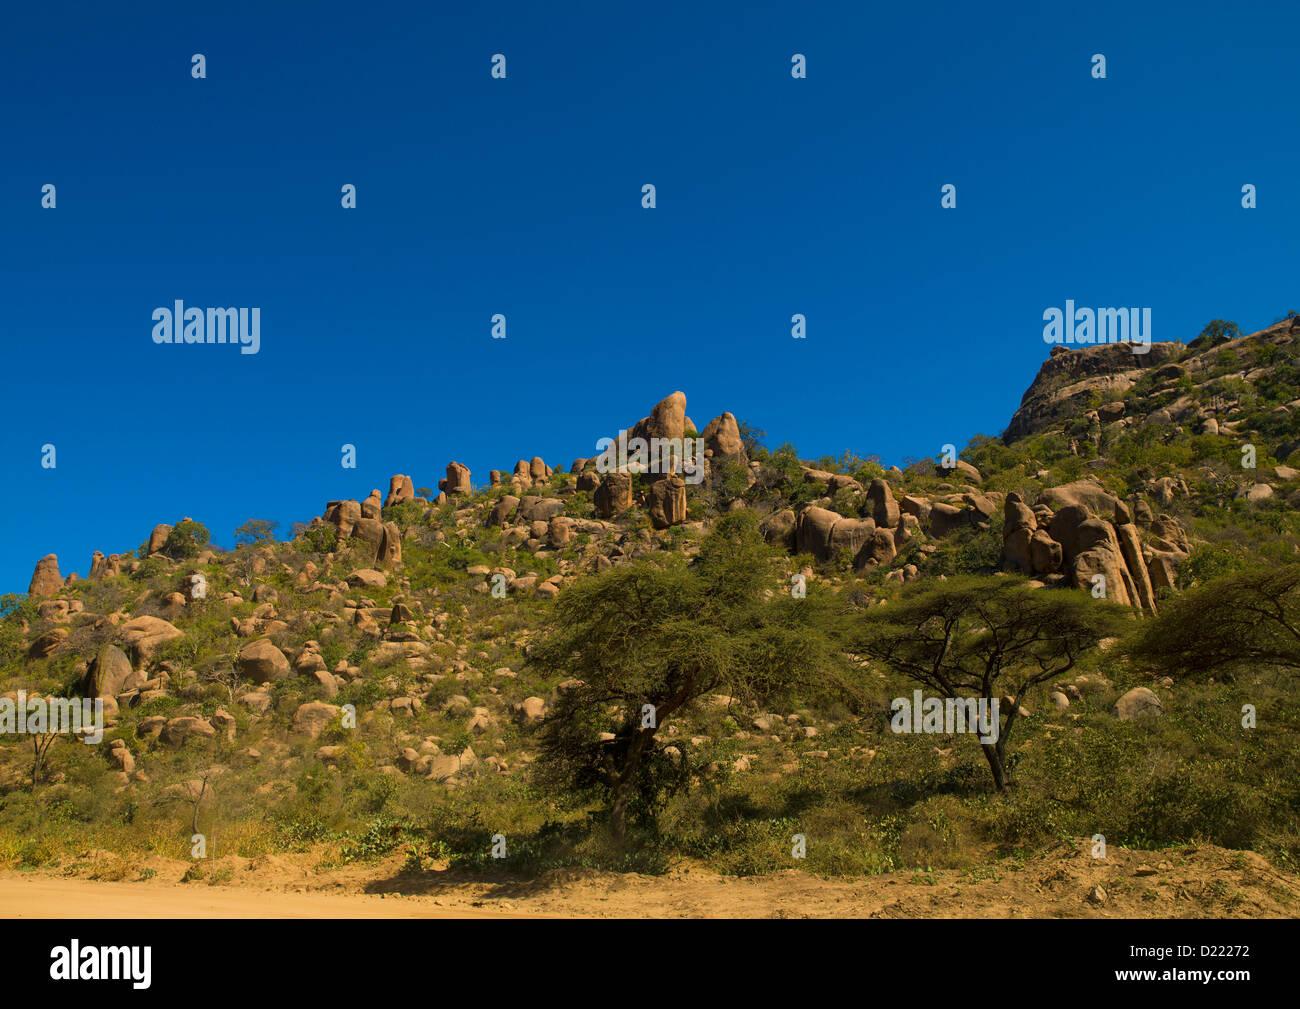 Phallic Rocks At The Valley Of Marvels, Babile, Ethiopia Stock Photo